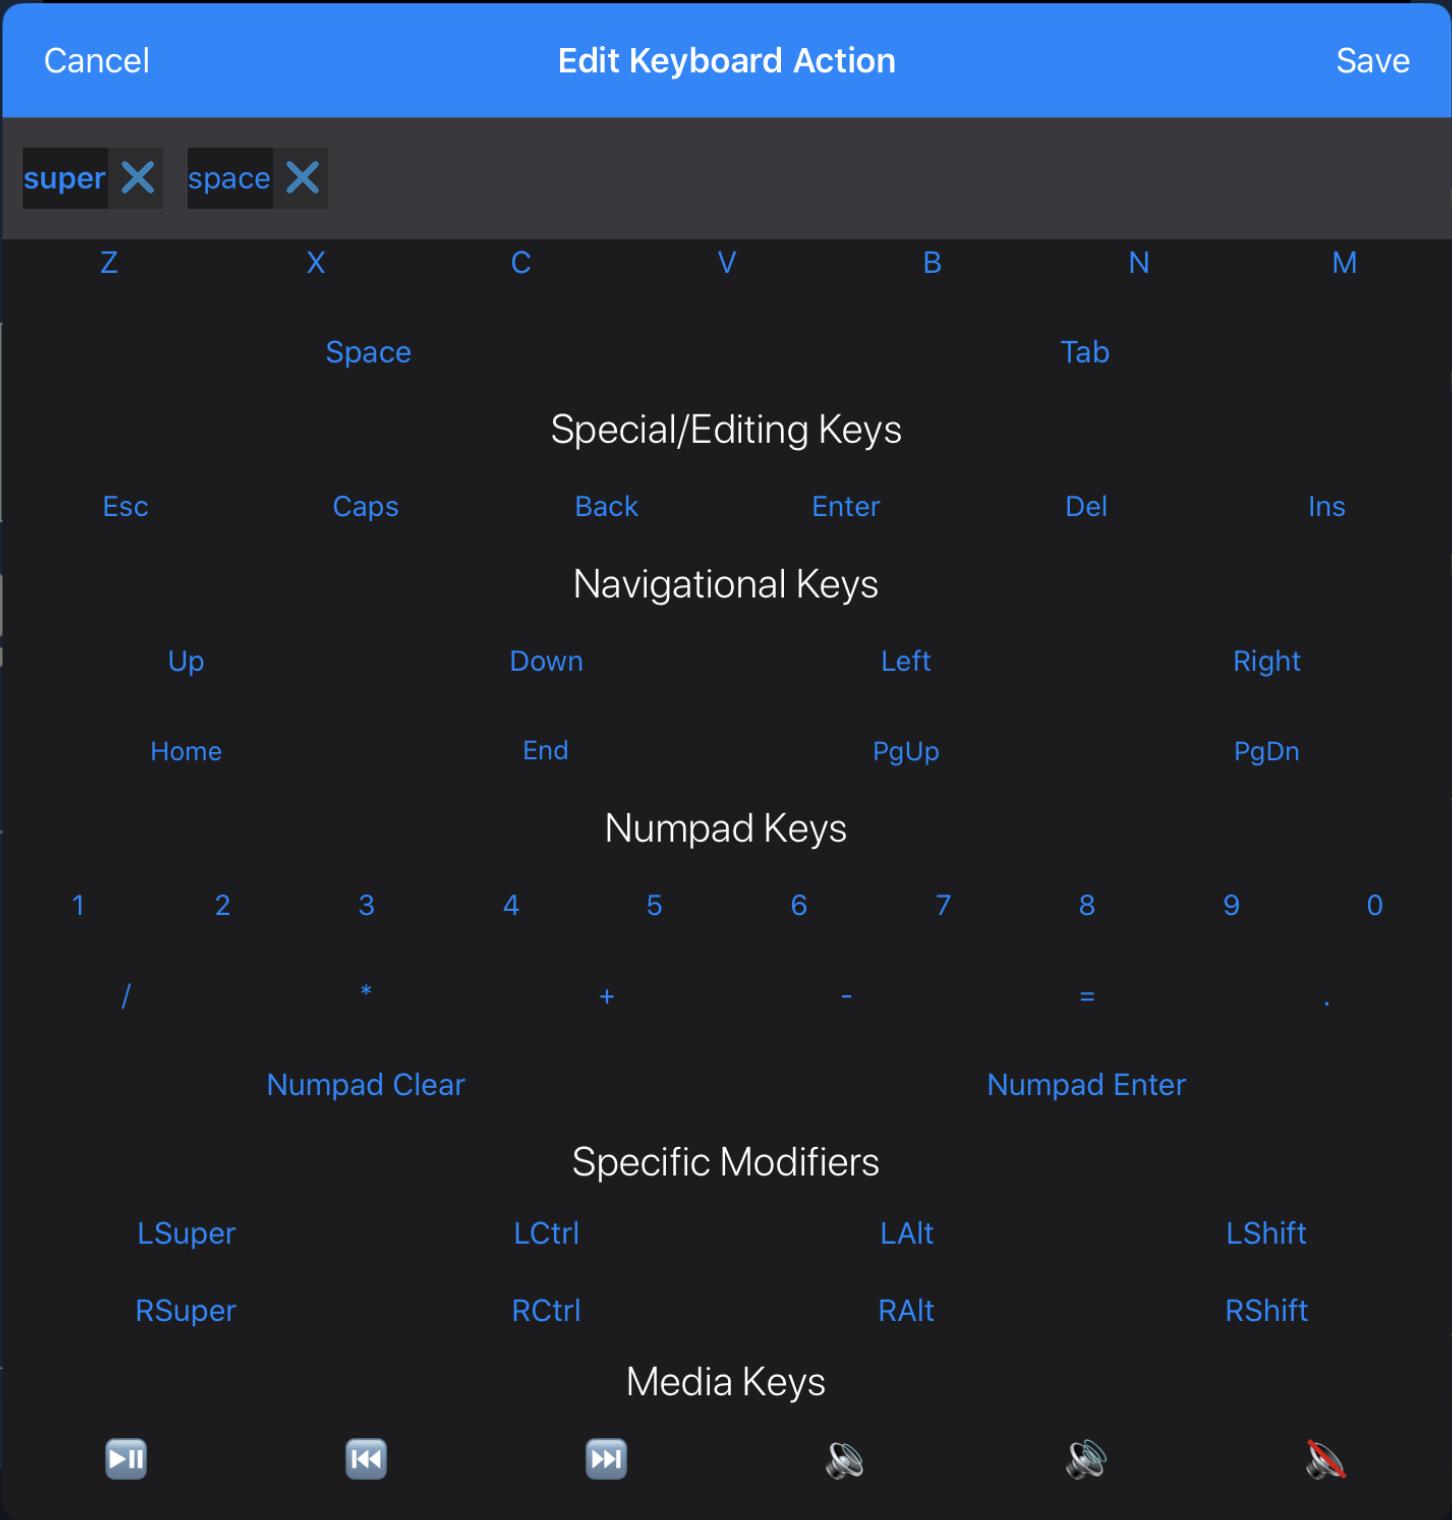 ActionPad Quick Guide